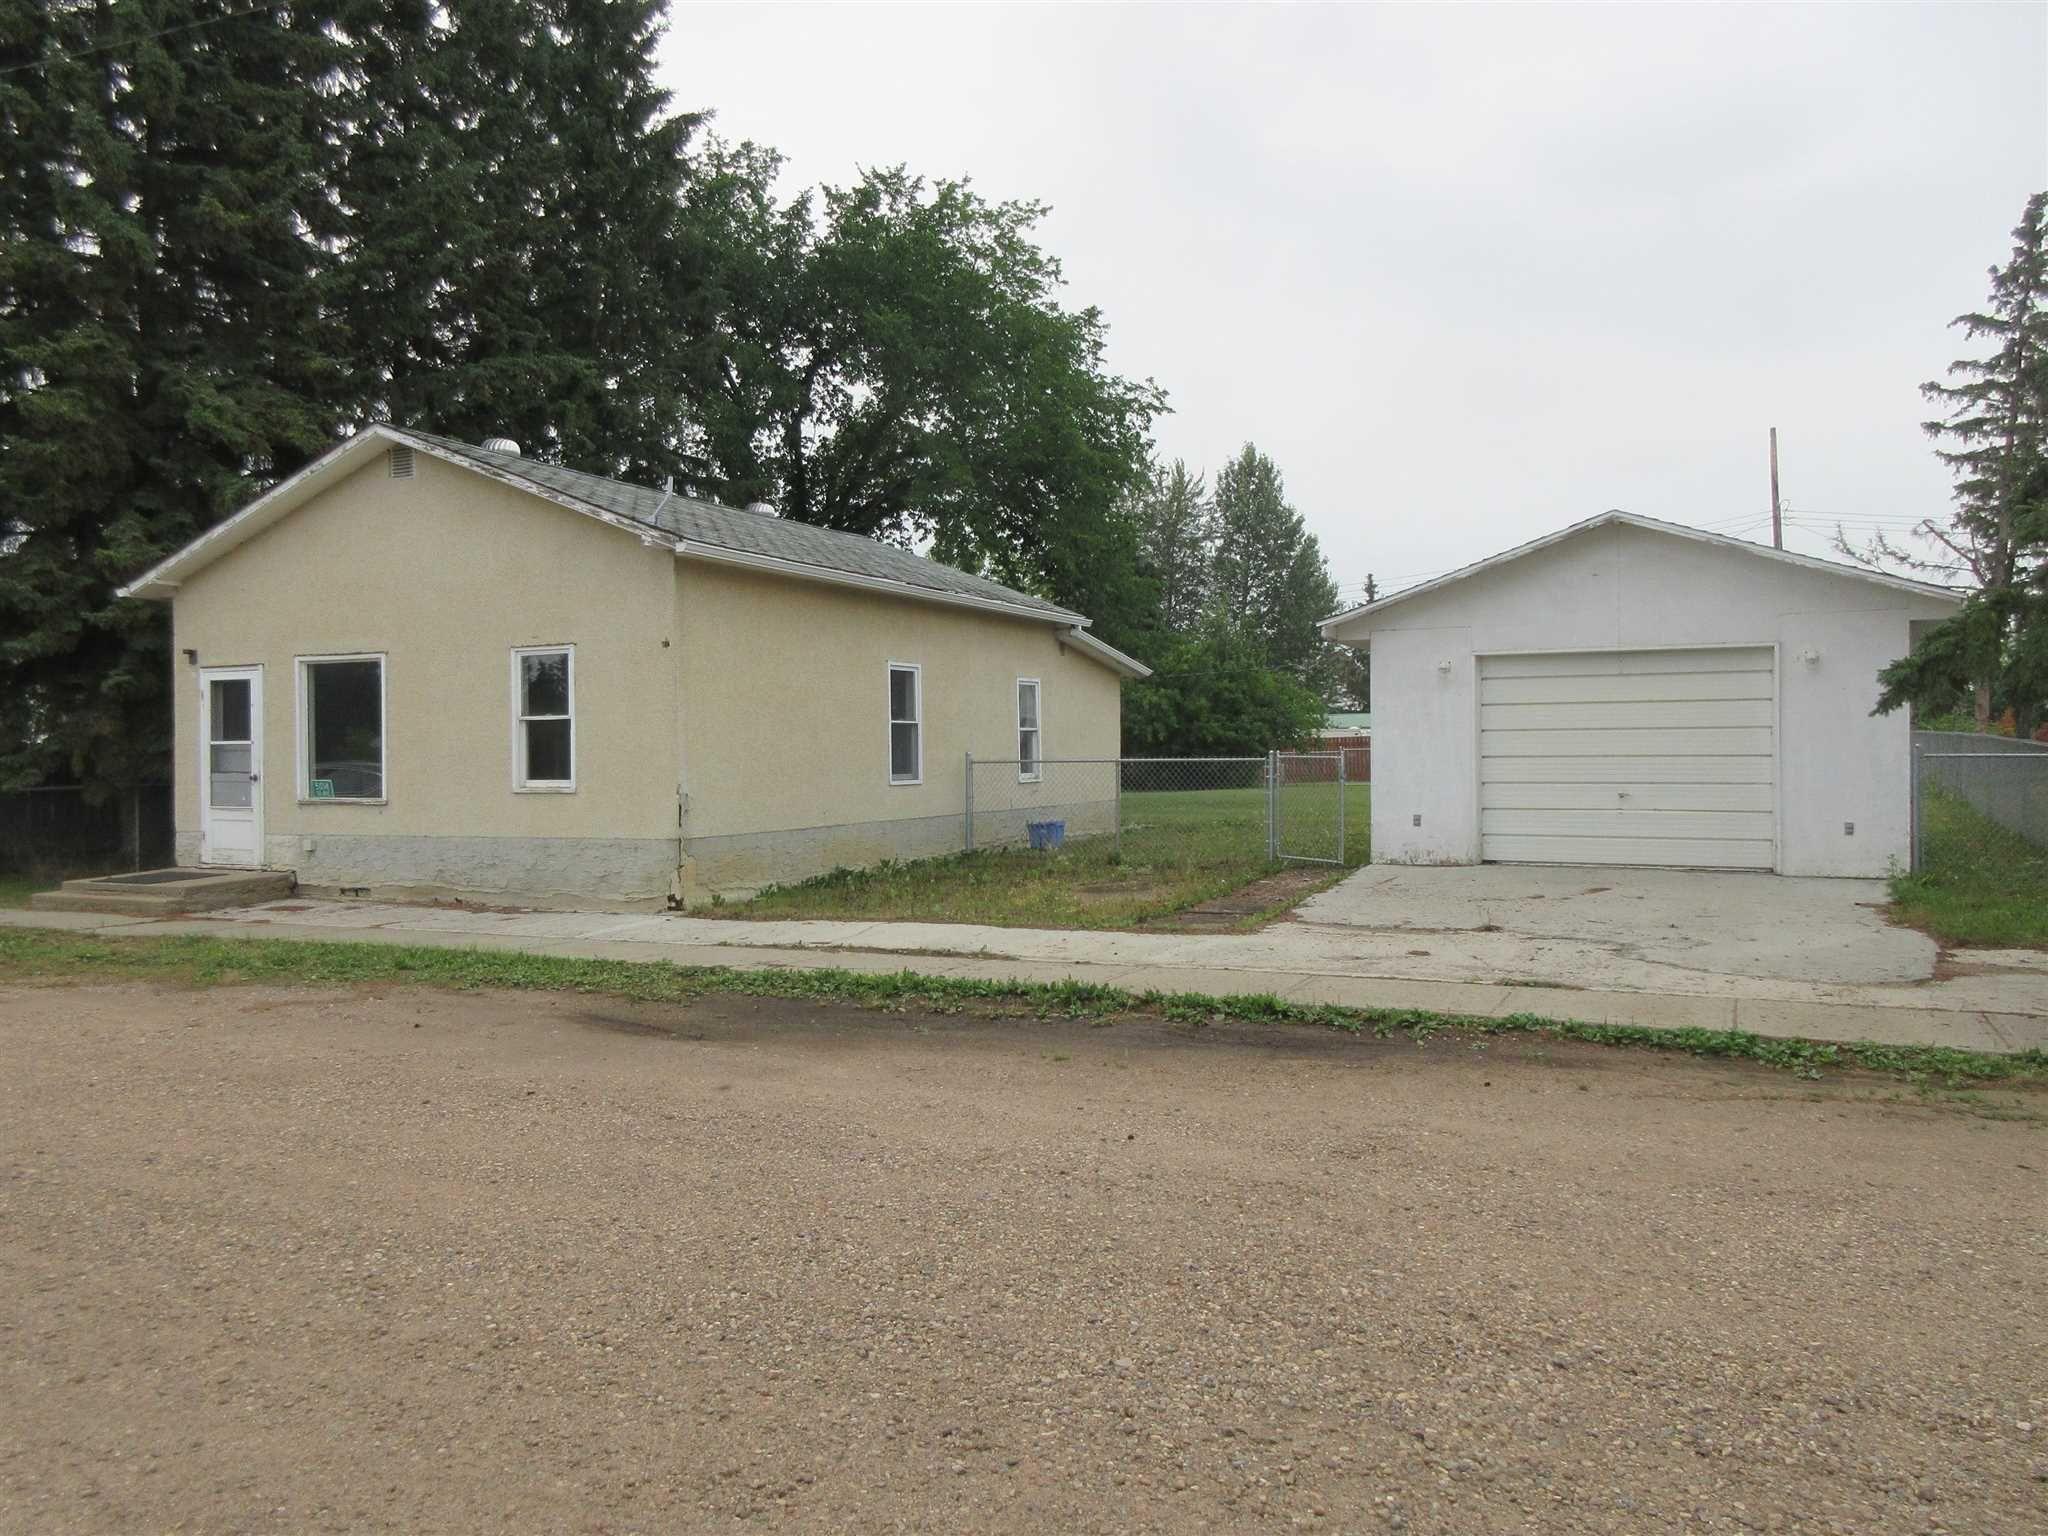 Main Photo: 5015 50: Egremont House for sale : MLS®# E4255347